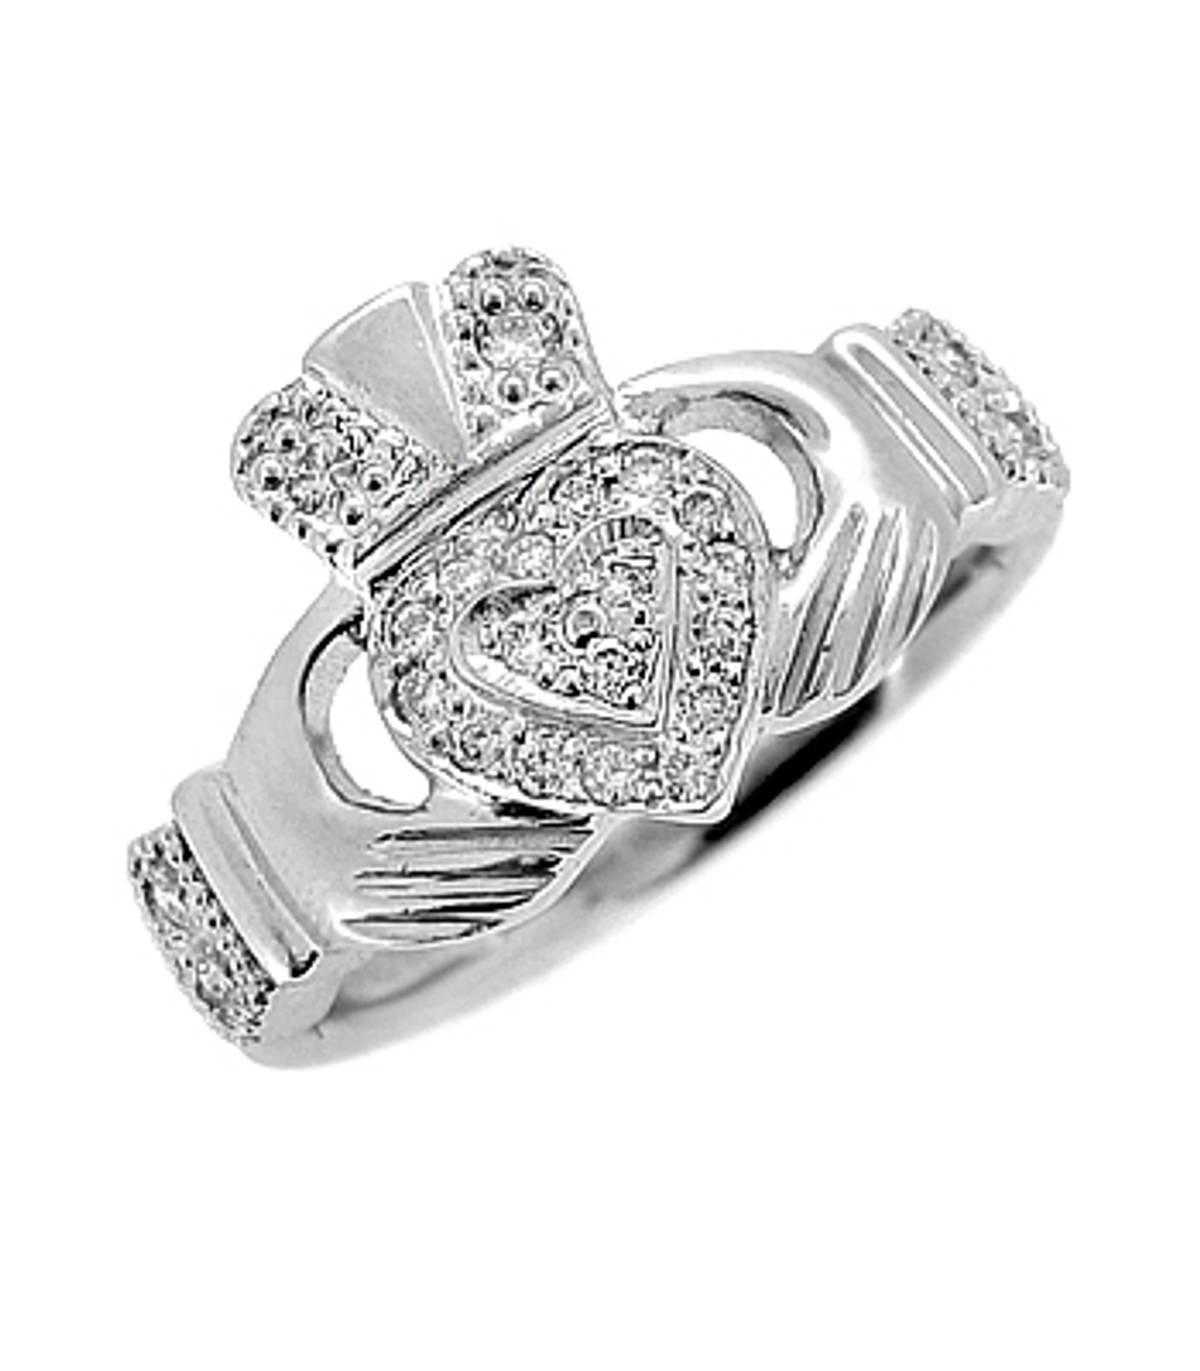 Irish made14 carat white gold 0.14cts diamonds claddagh engagement ring